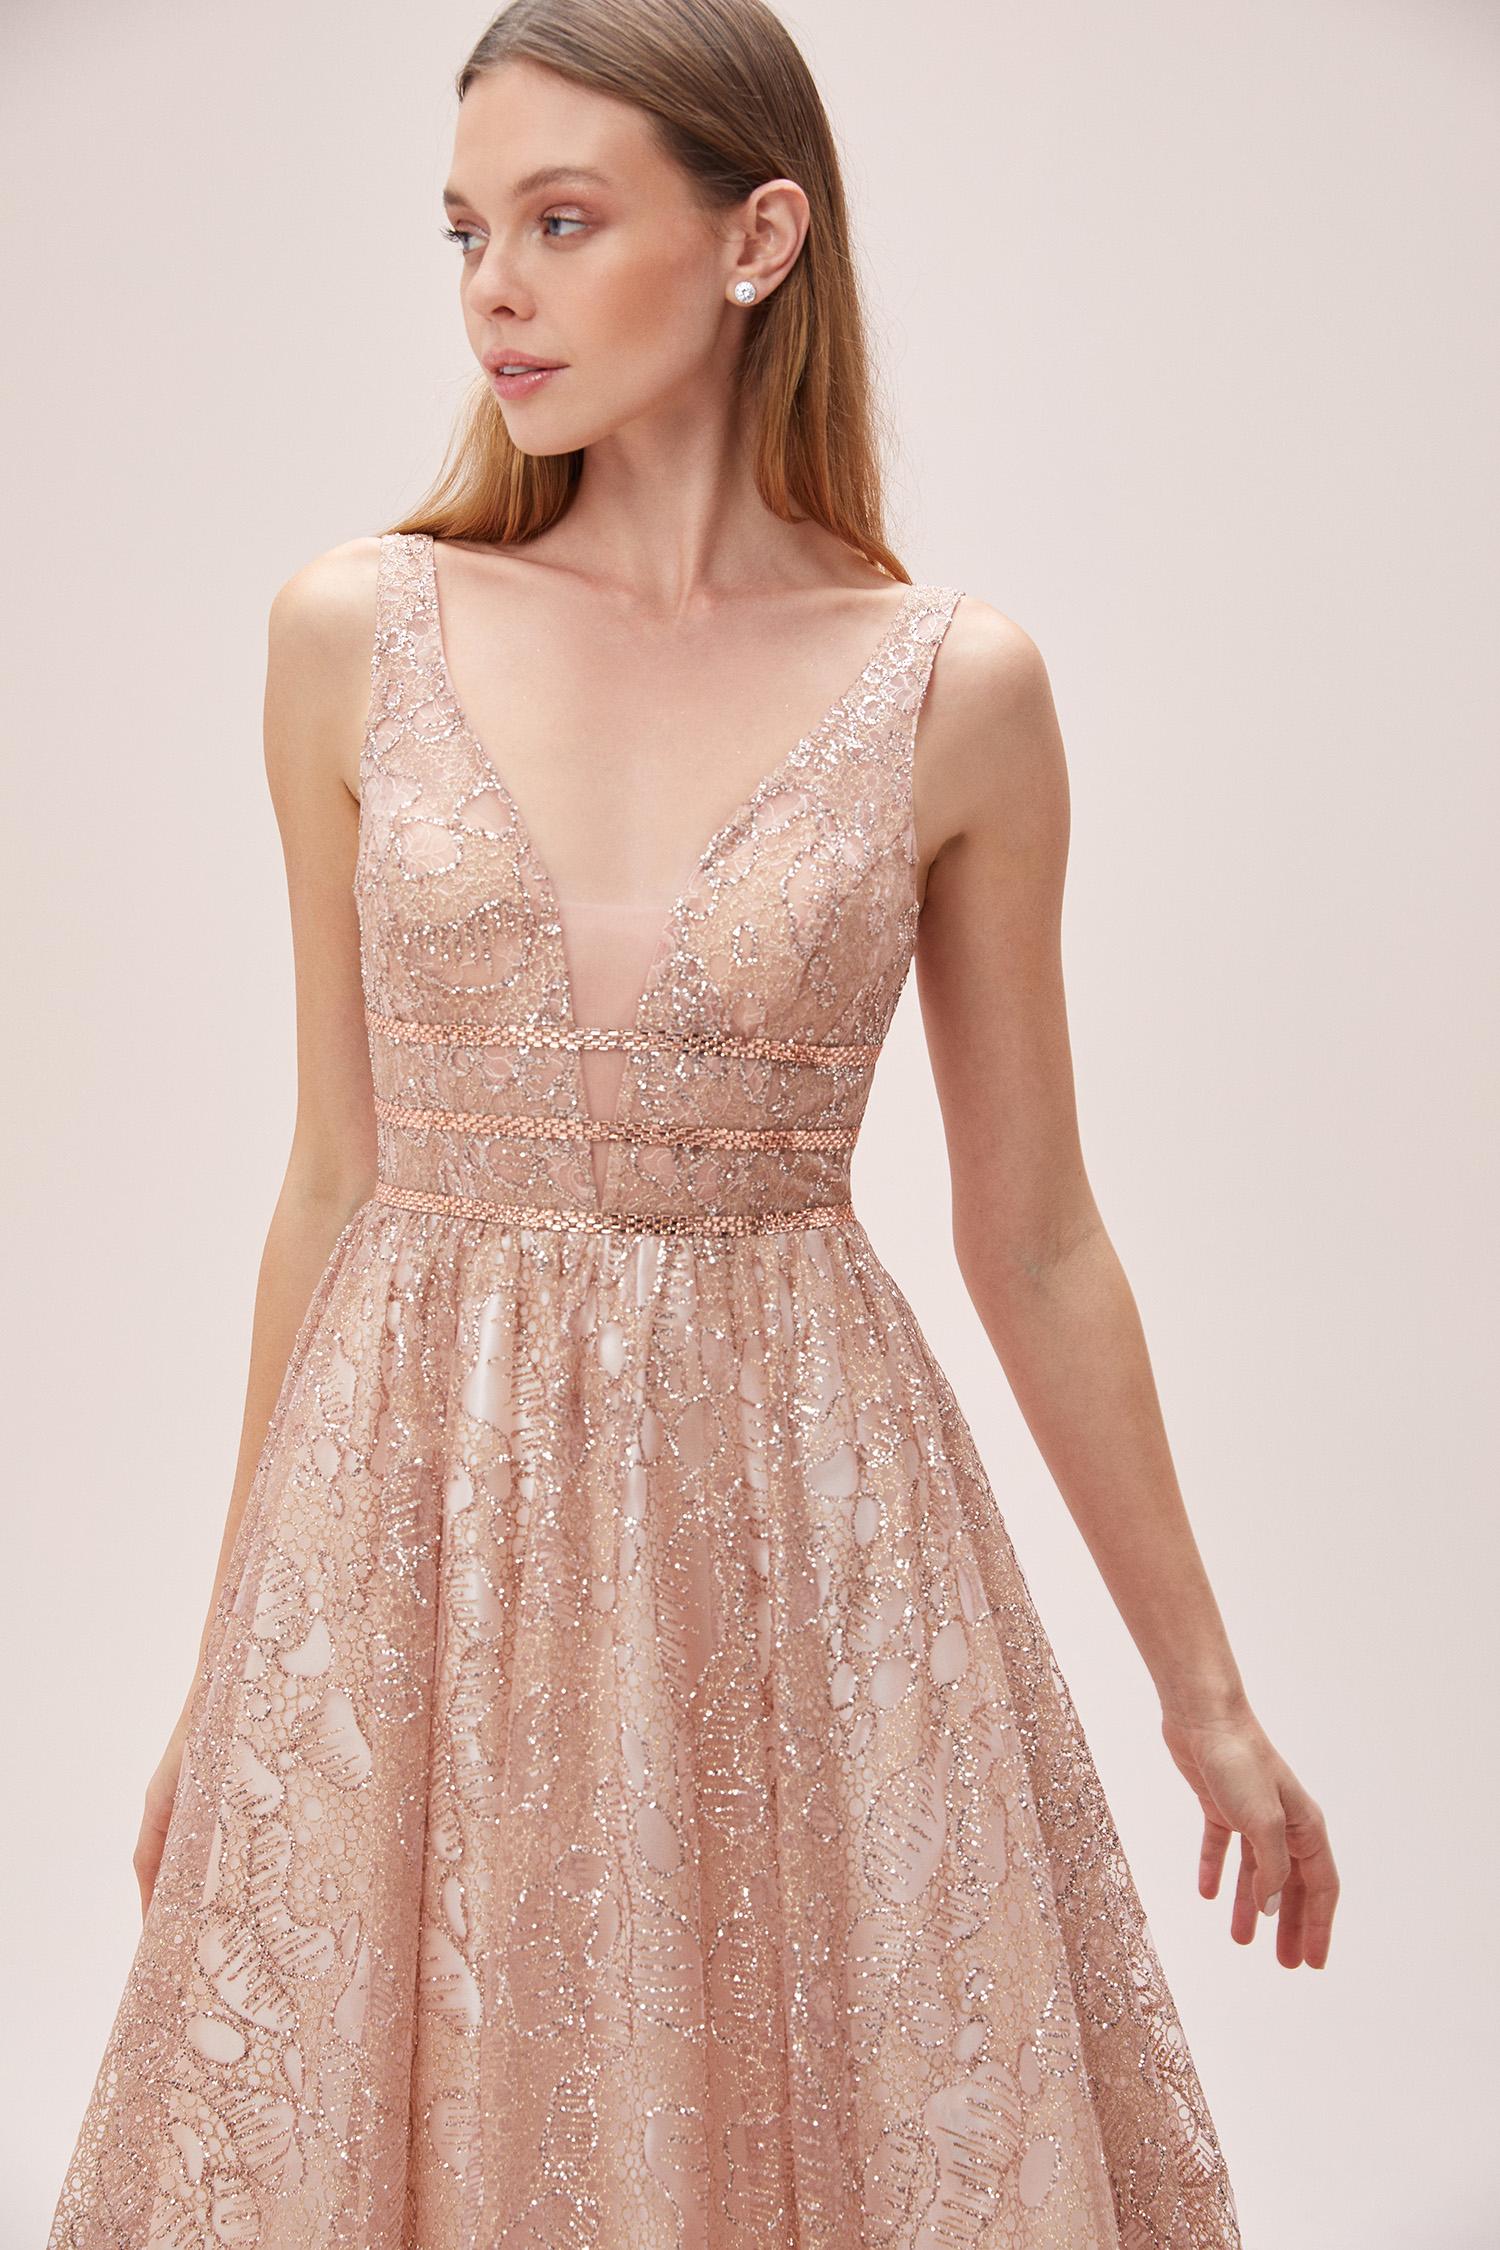 Toz Pembe Askılı V Yaka Işıltılı Romantik Abiye Elbise - Thumbnail